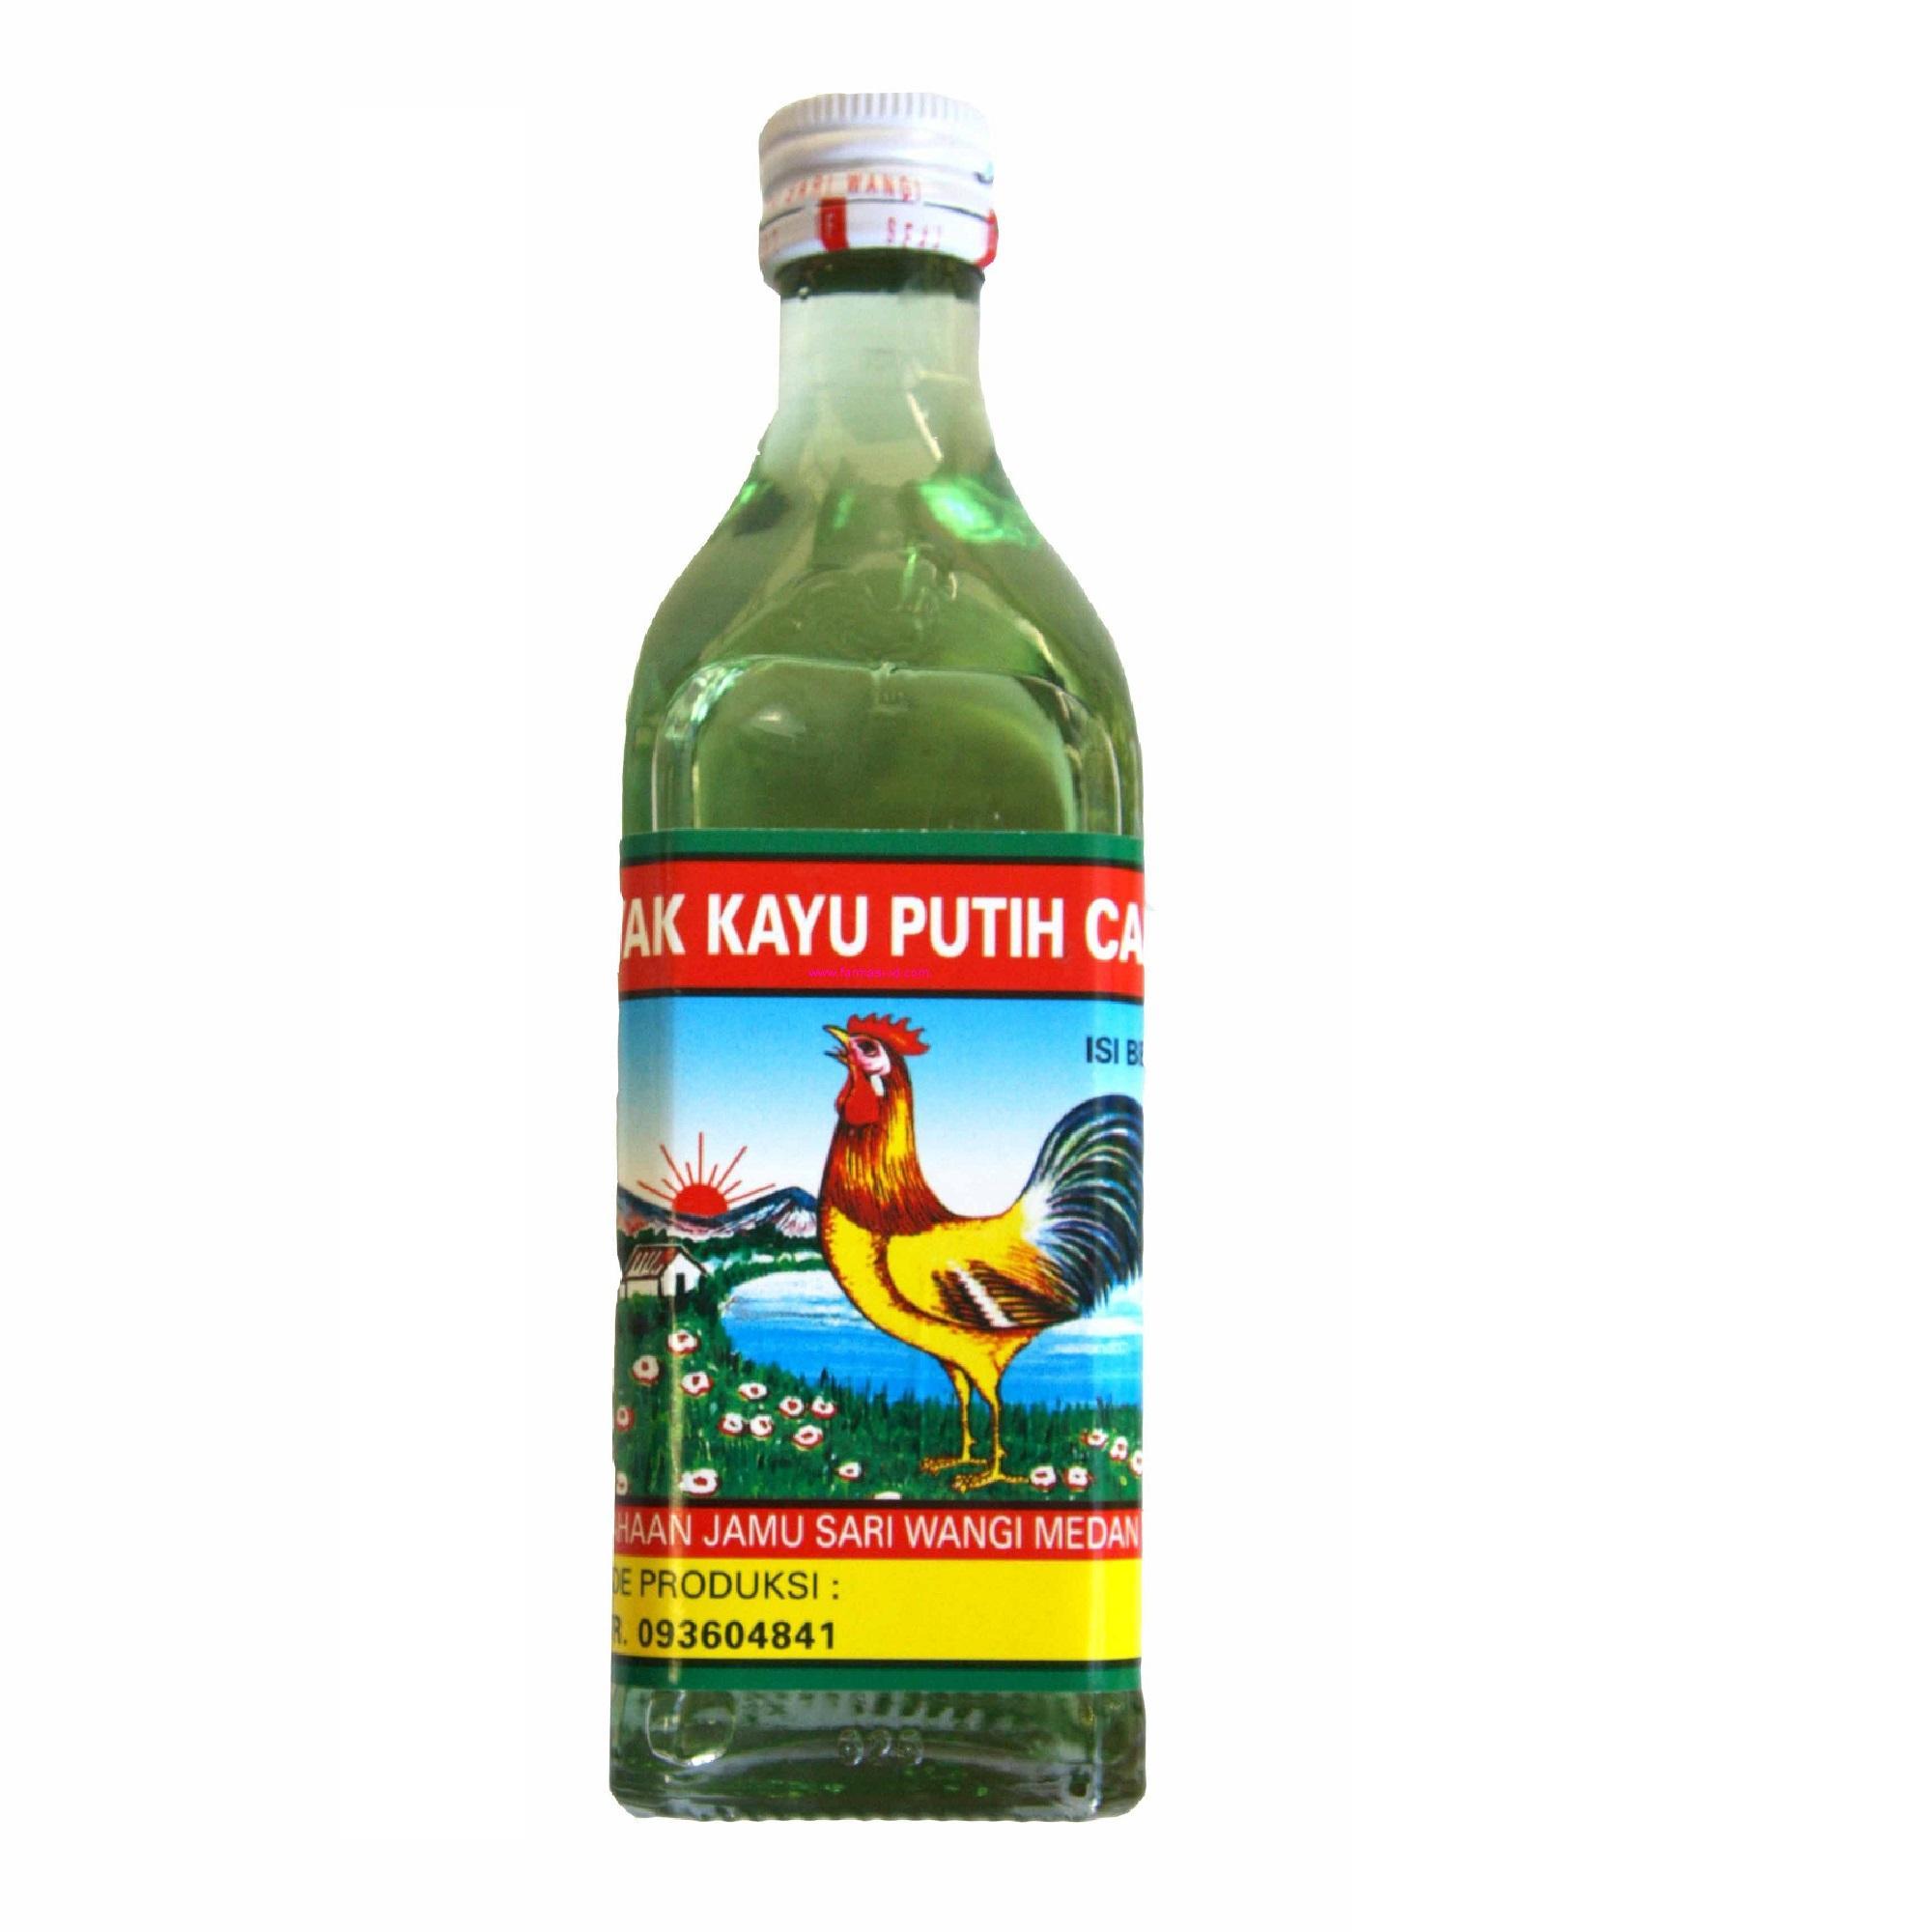 Minyak Kayu Putih Cap Ayam ORIGINAL ( dijamin)  150ml 1 Botol